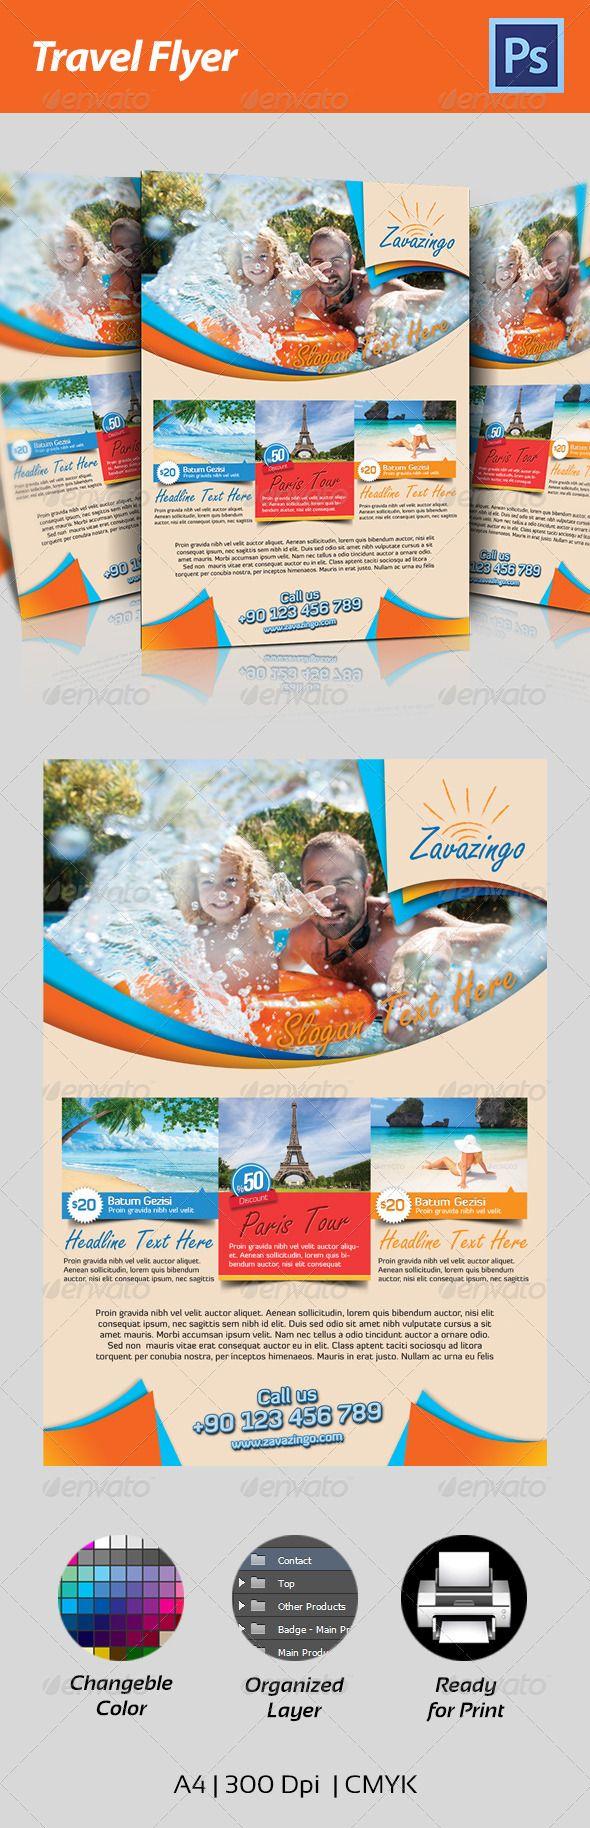 149 best tourism&travel layout images on Pinterest | Flyer design ...